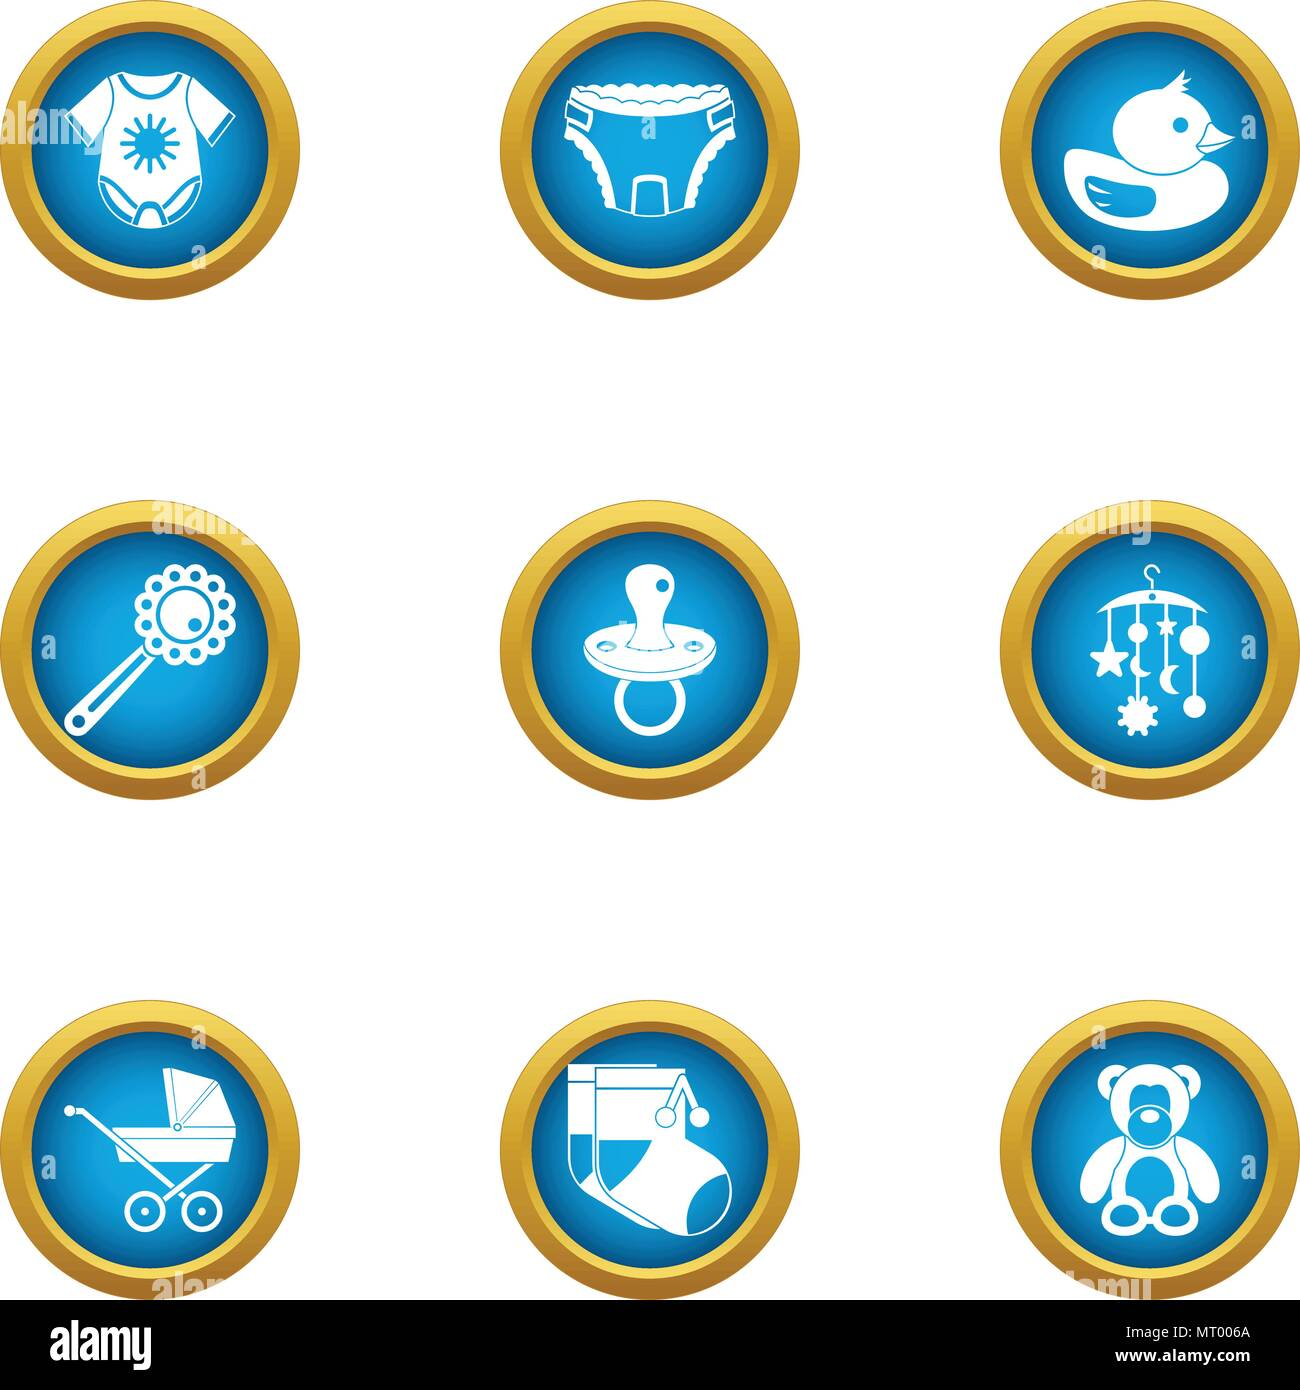 Children apparel icons set, flat style - Stock Image